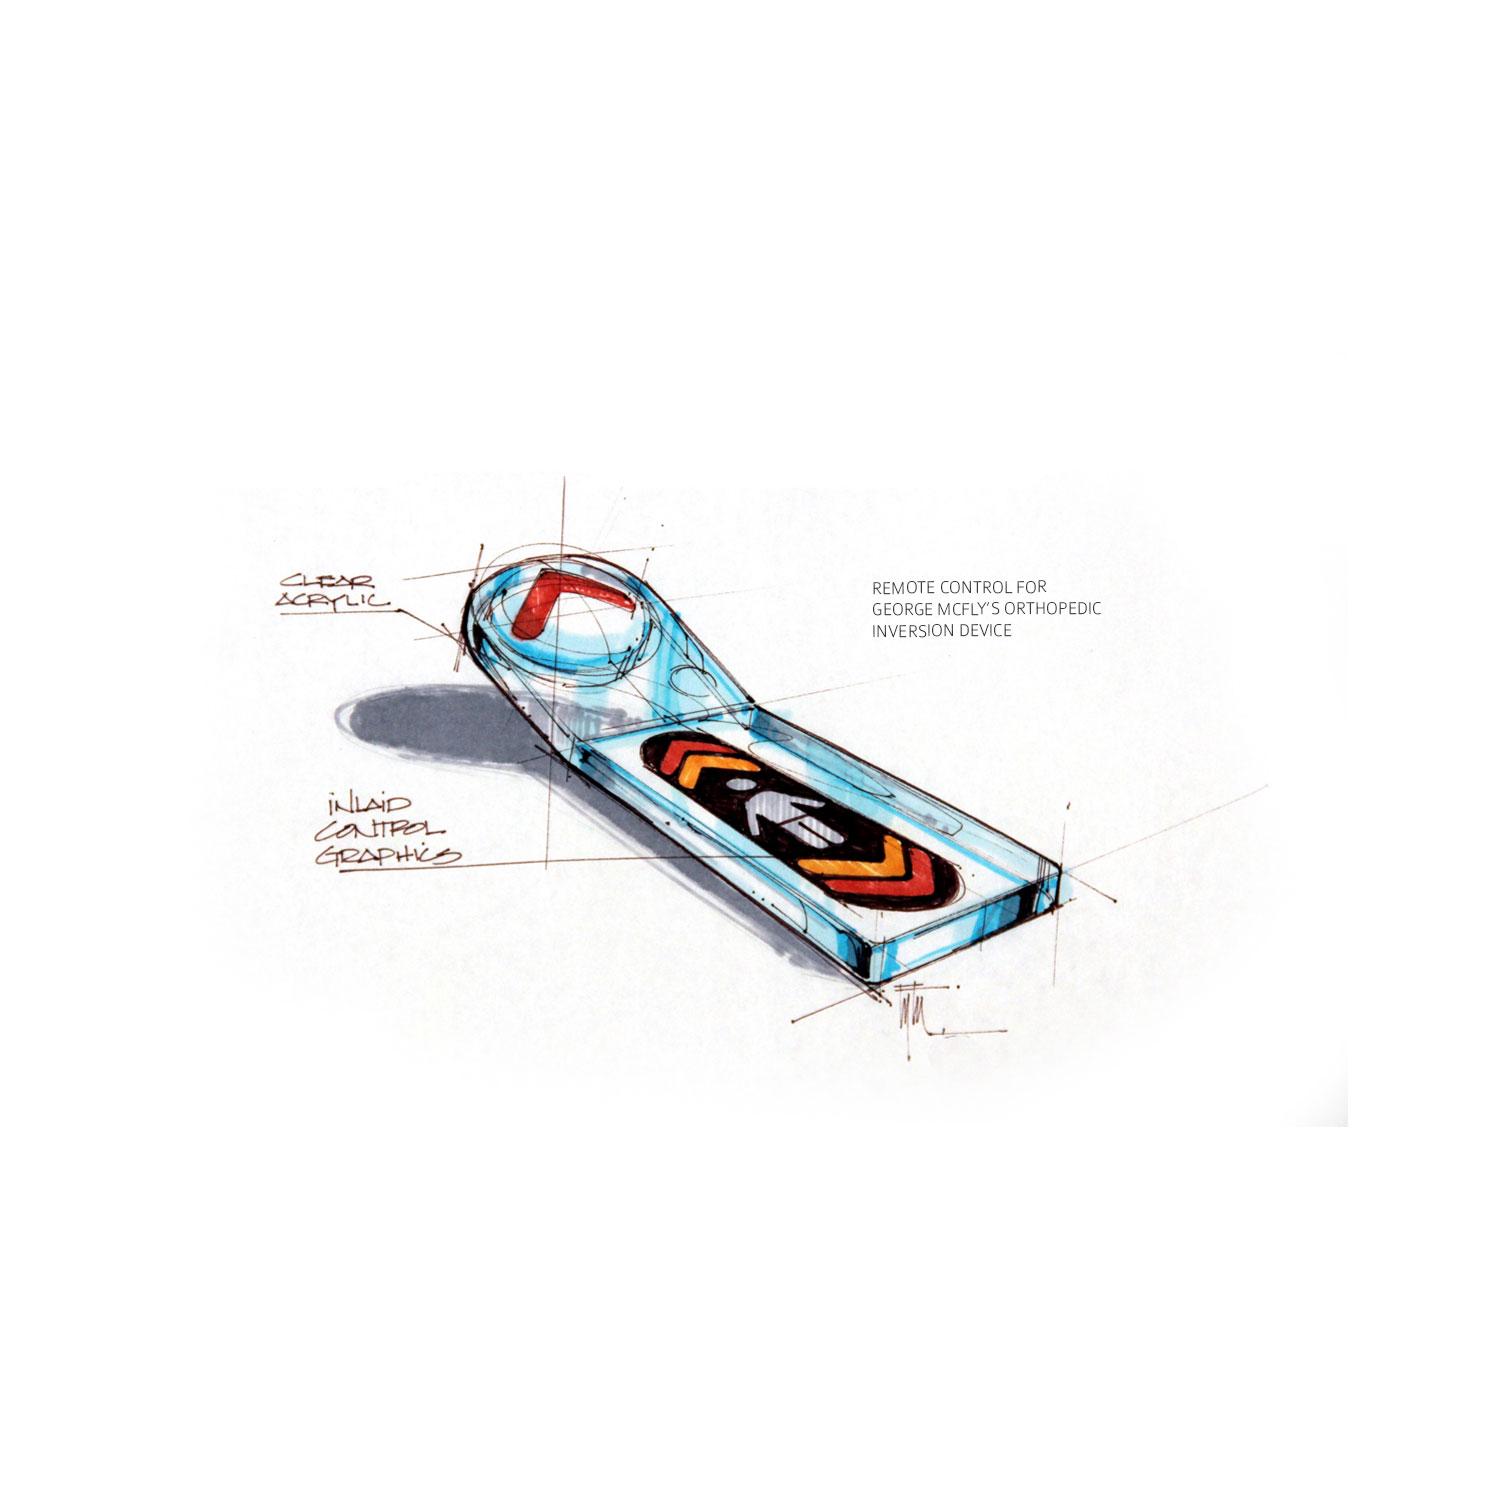 Ortho Inversion Remote Control